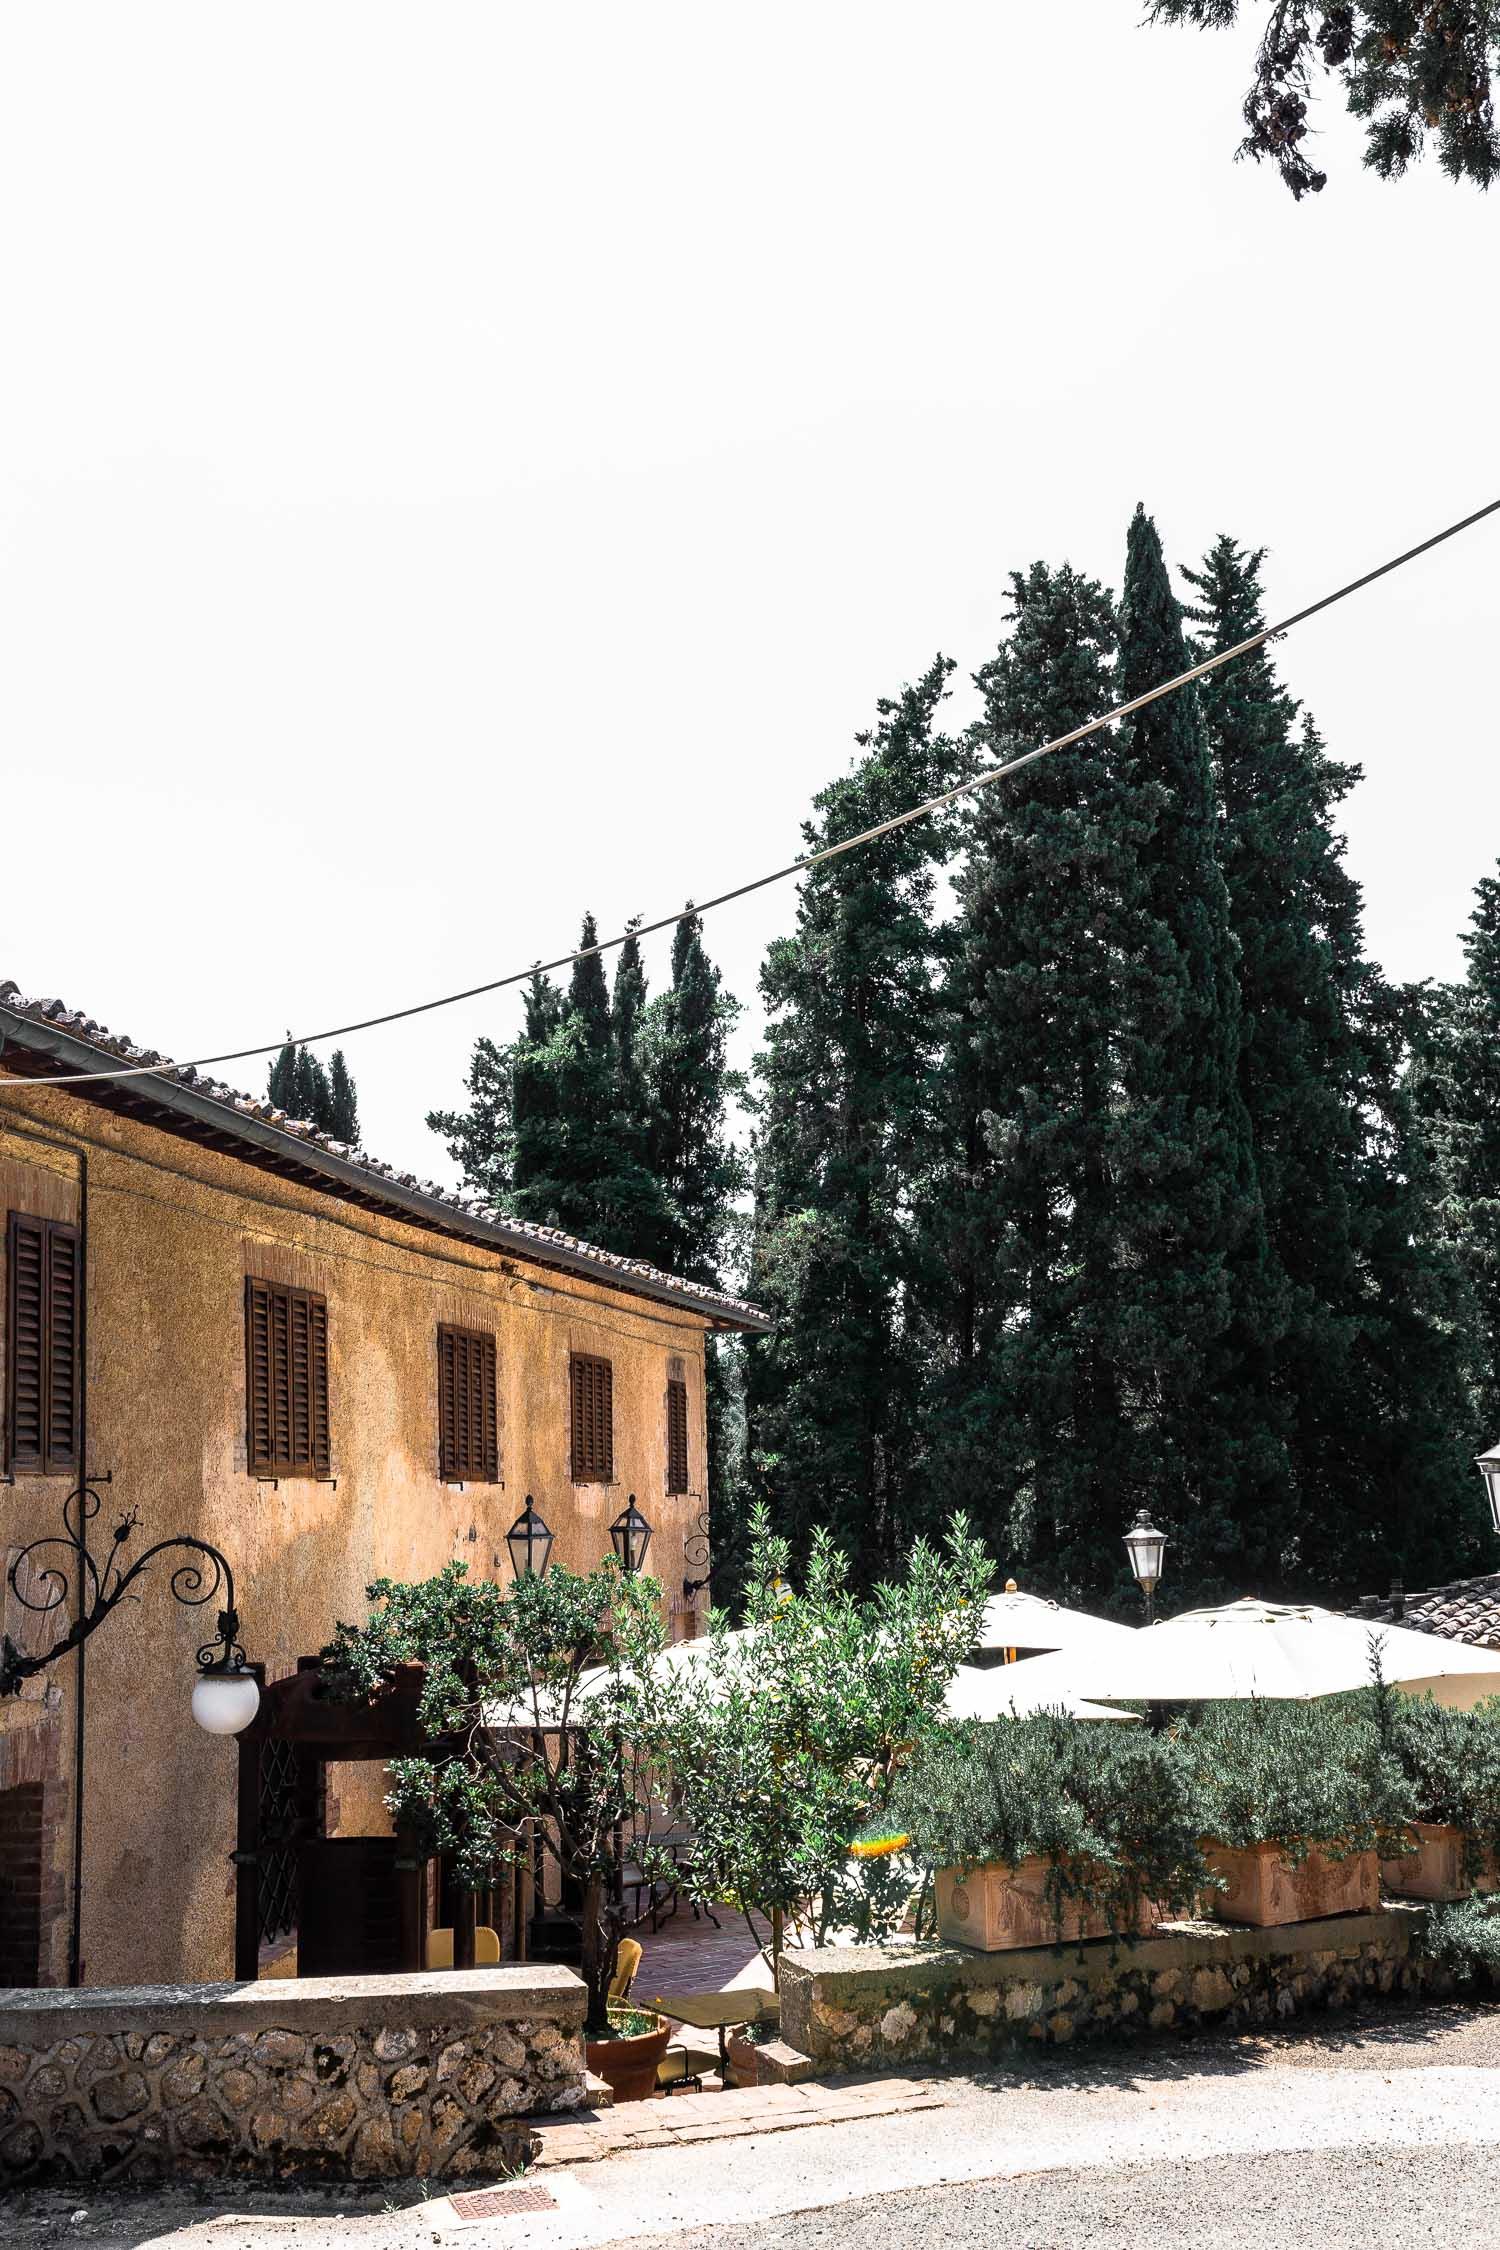 Tuscany-Relais-La-Suvera-Restaurant-4696.jpg